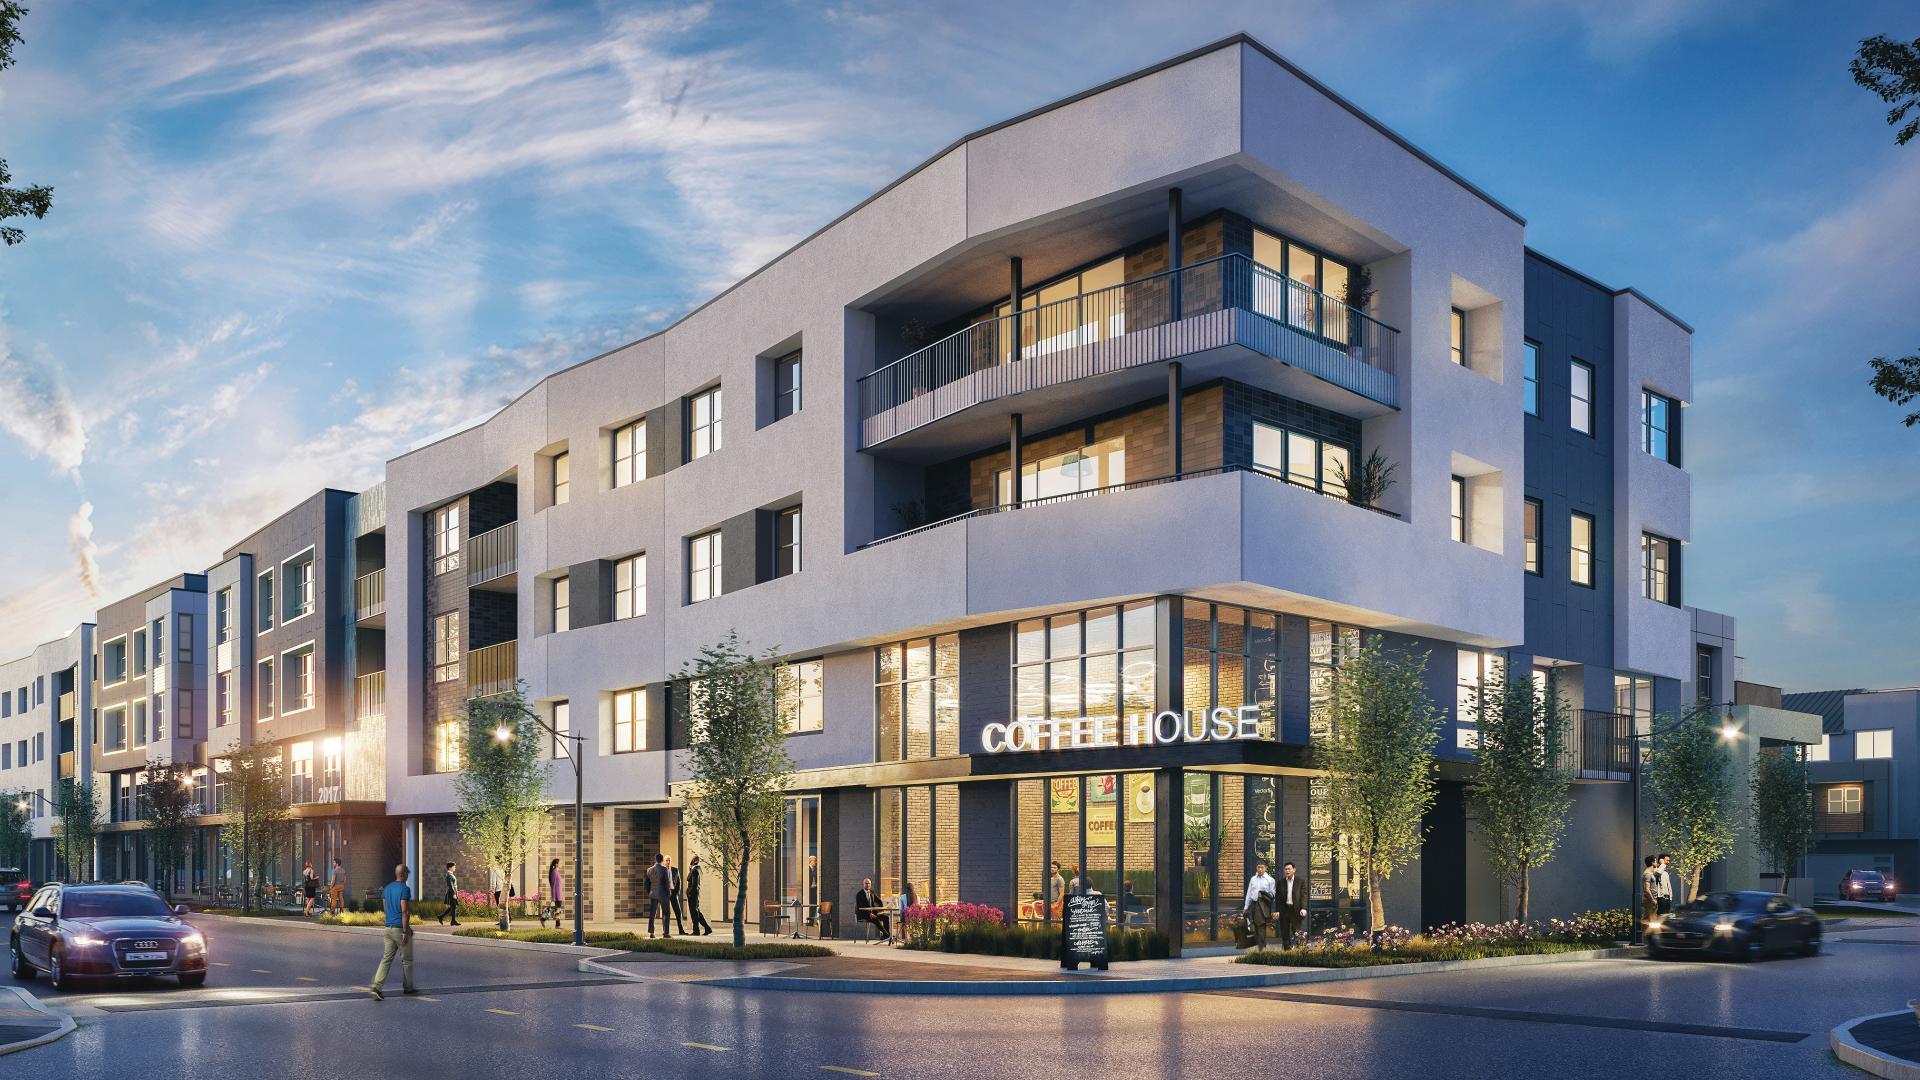 Future neighborhood retail on first floor